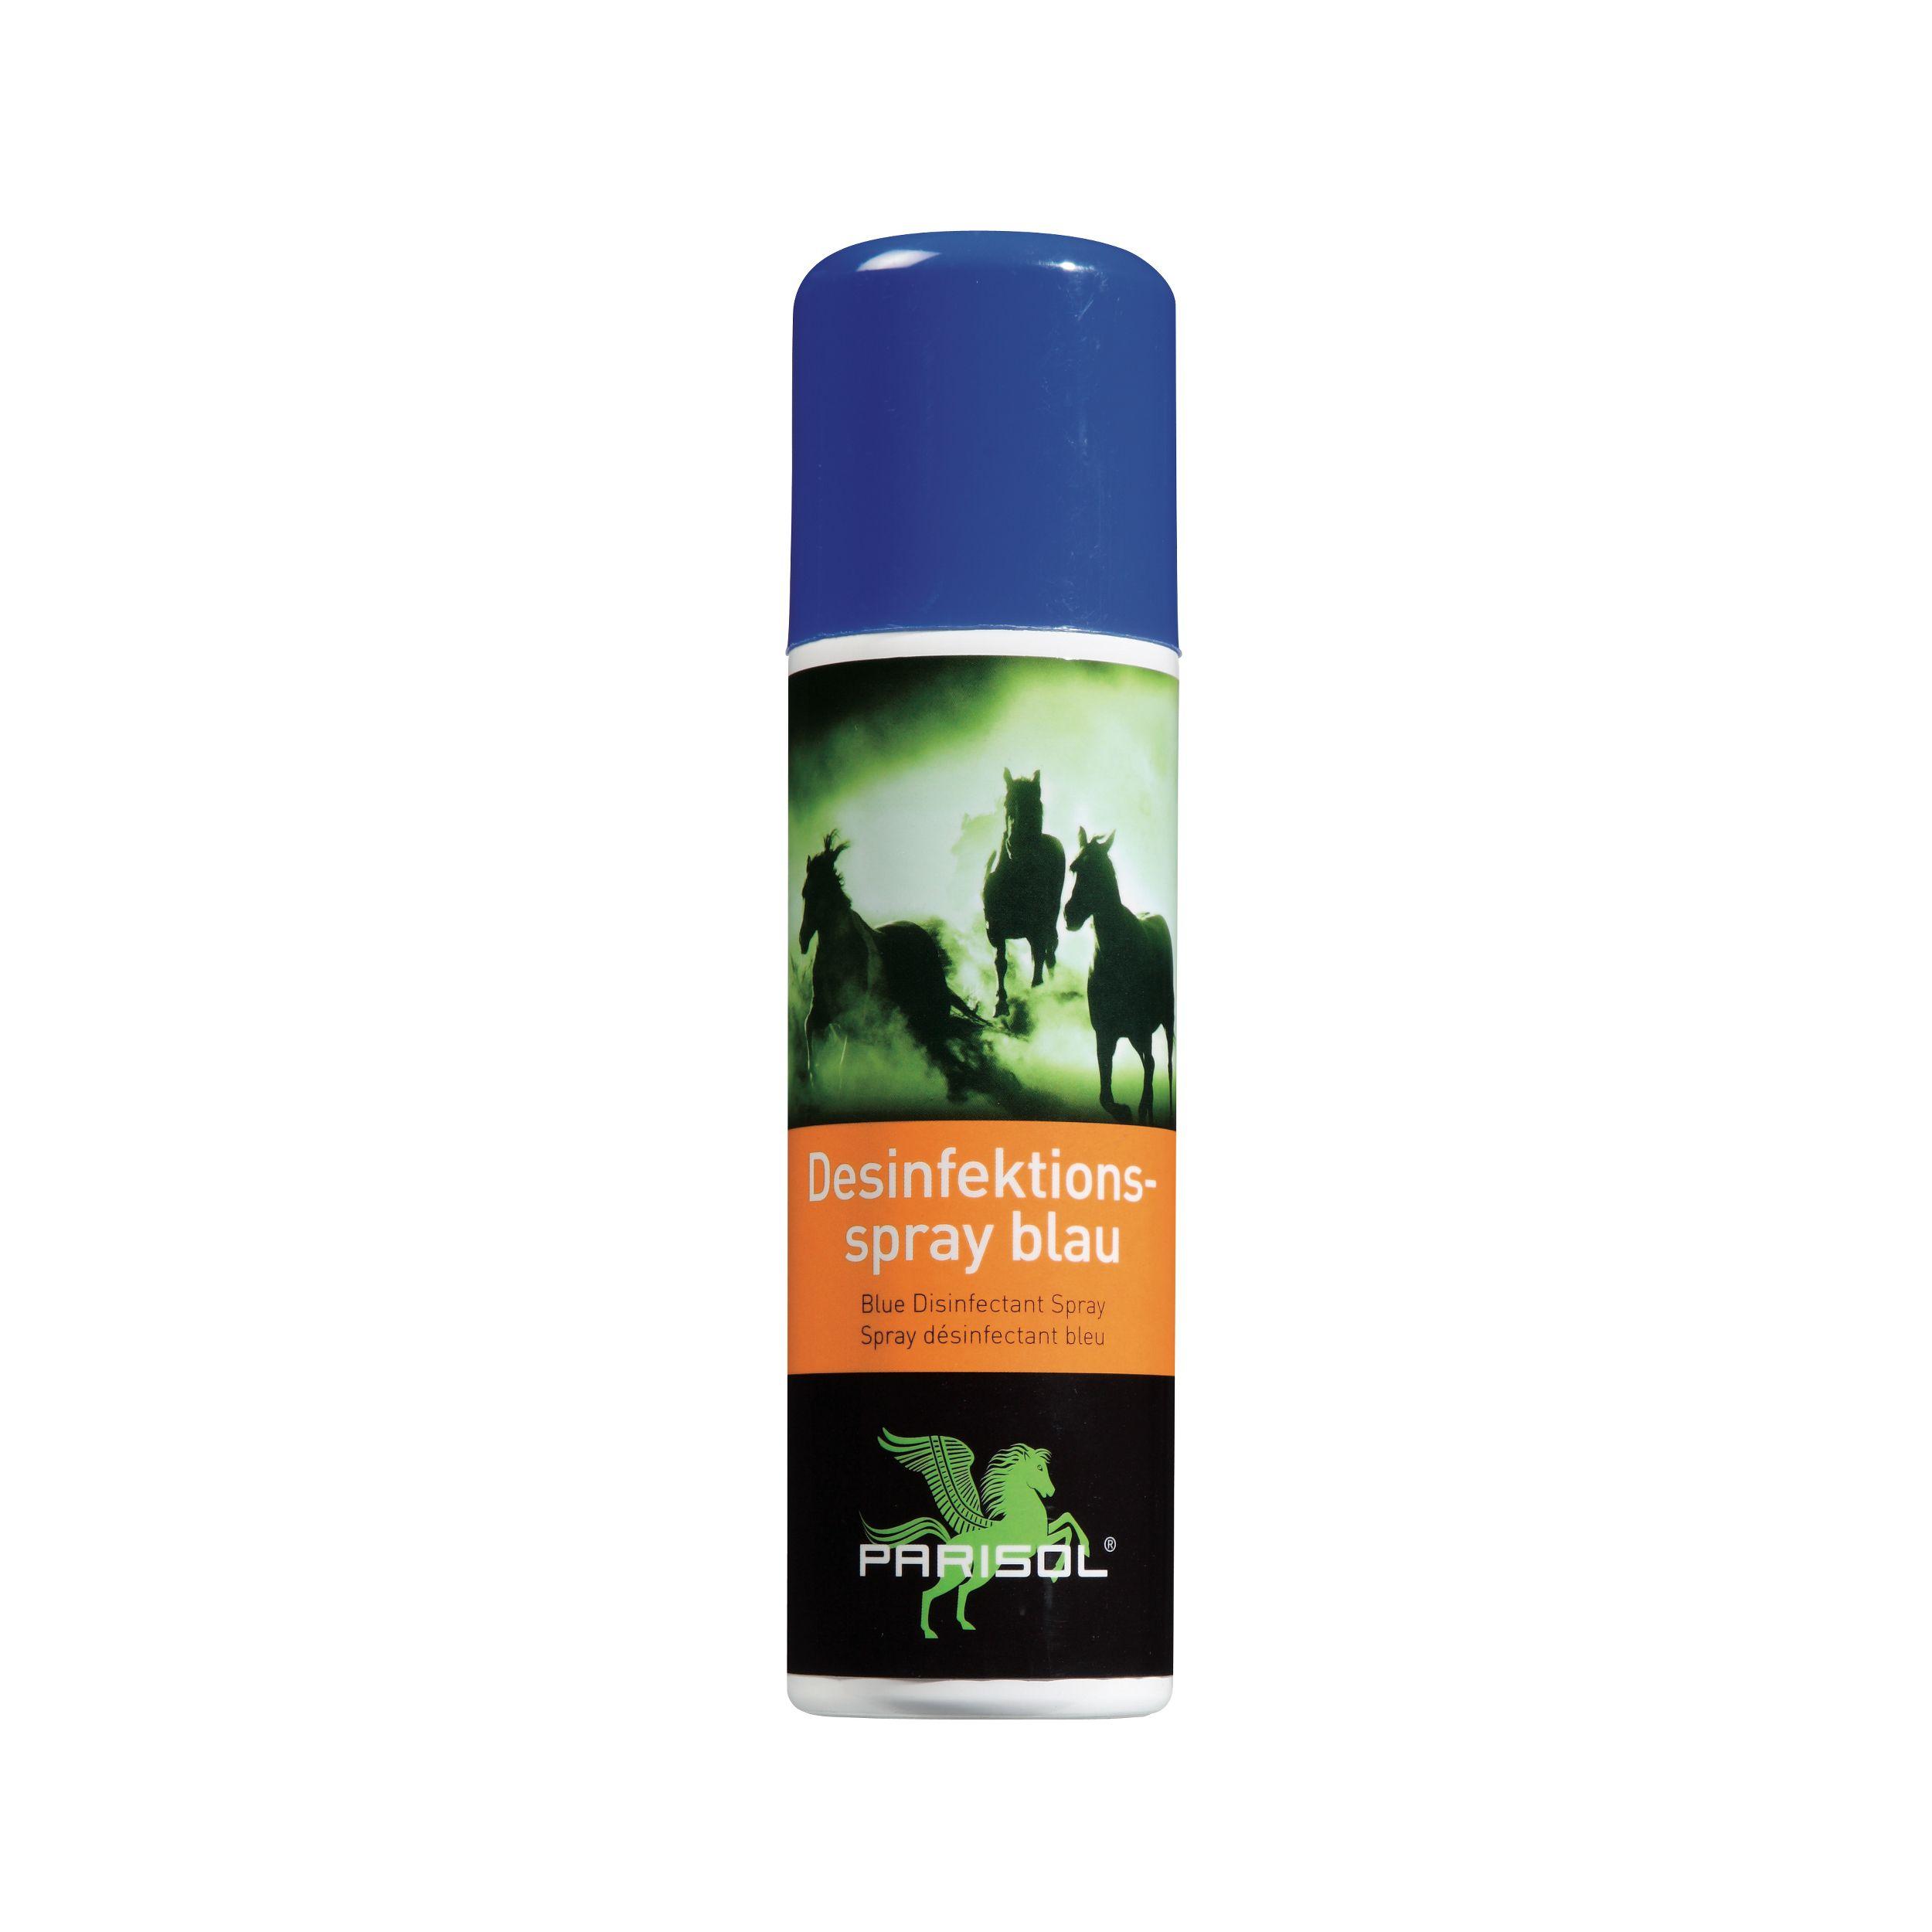 Parisol Desinfektionsspray blau 200 ml